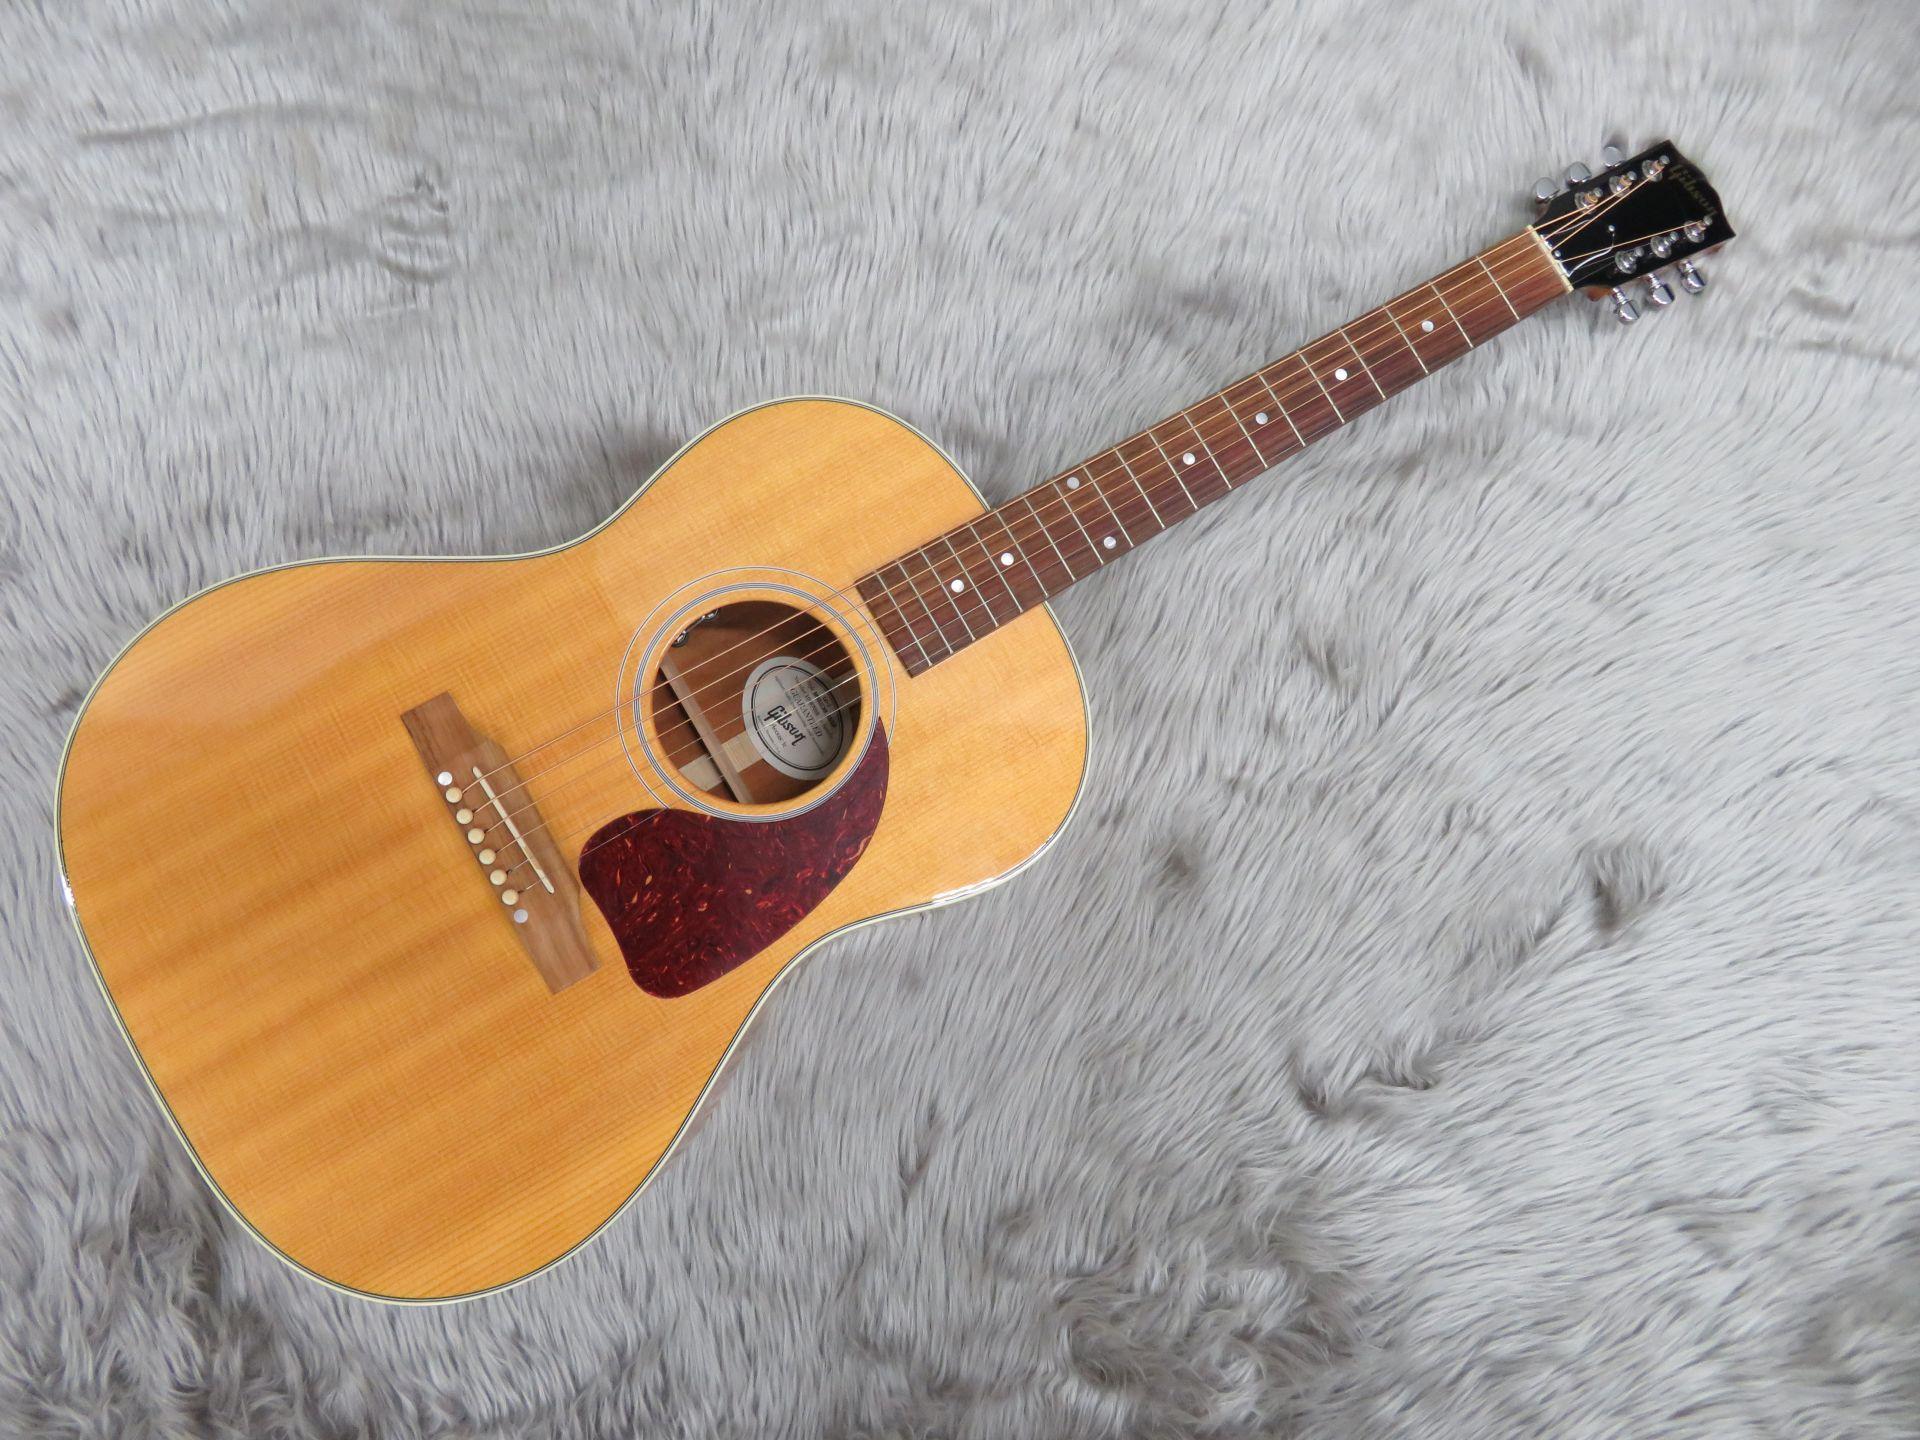 Gibson  LG-2 AMERICAN EAGLE 写真画像